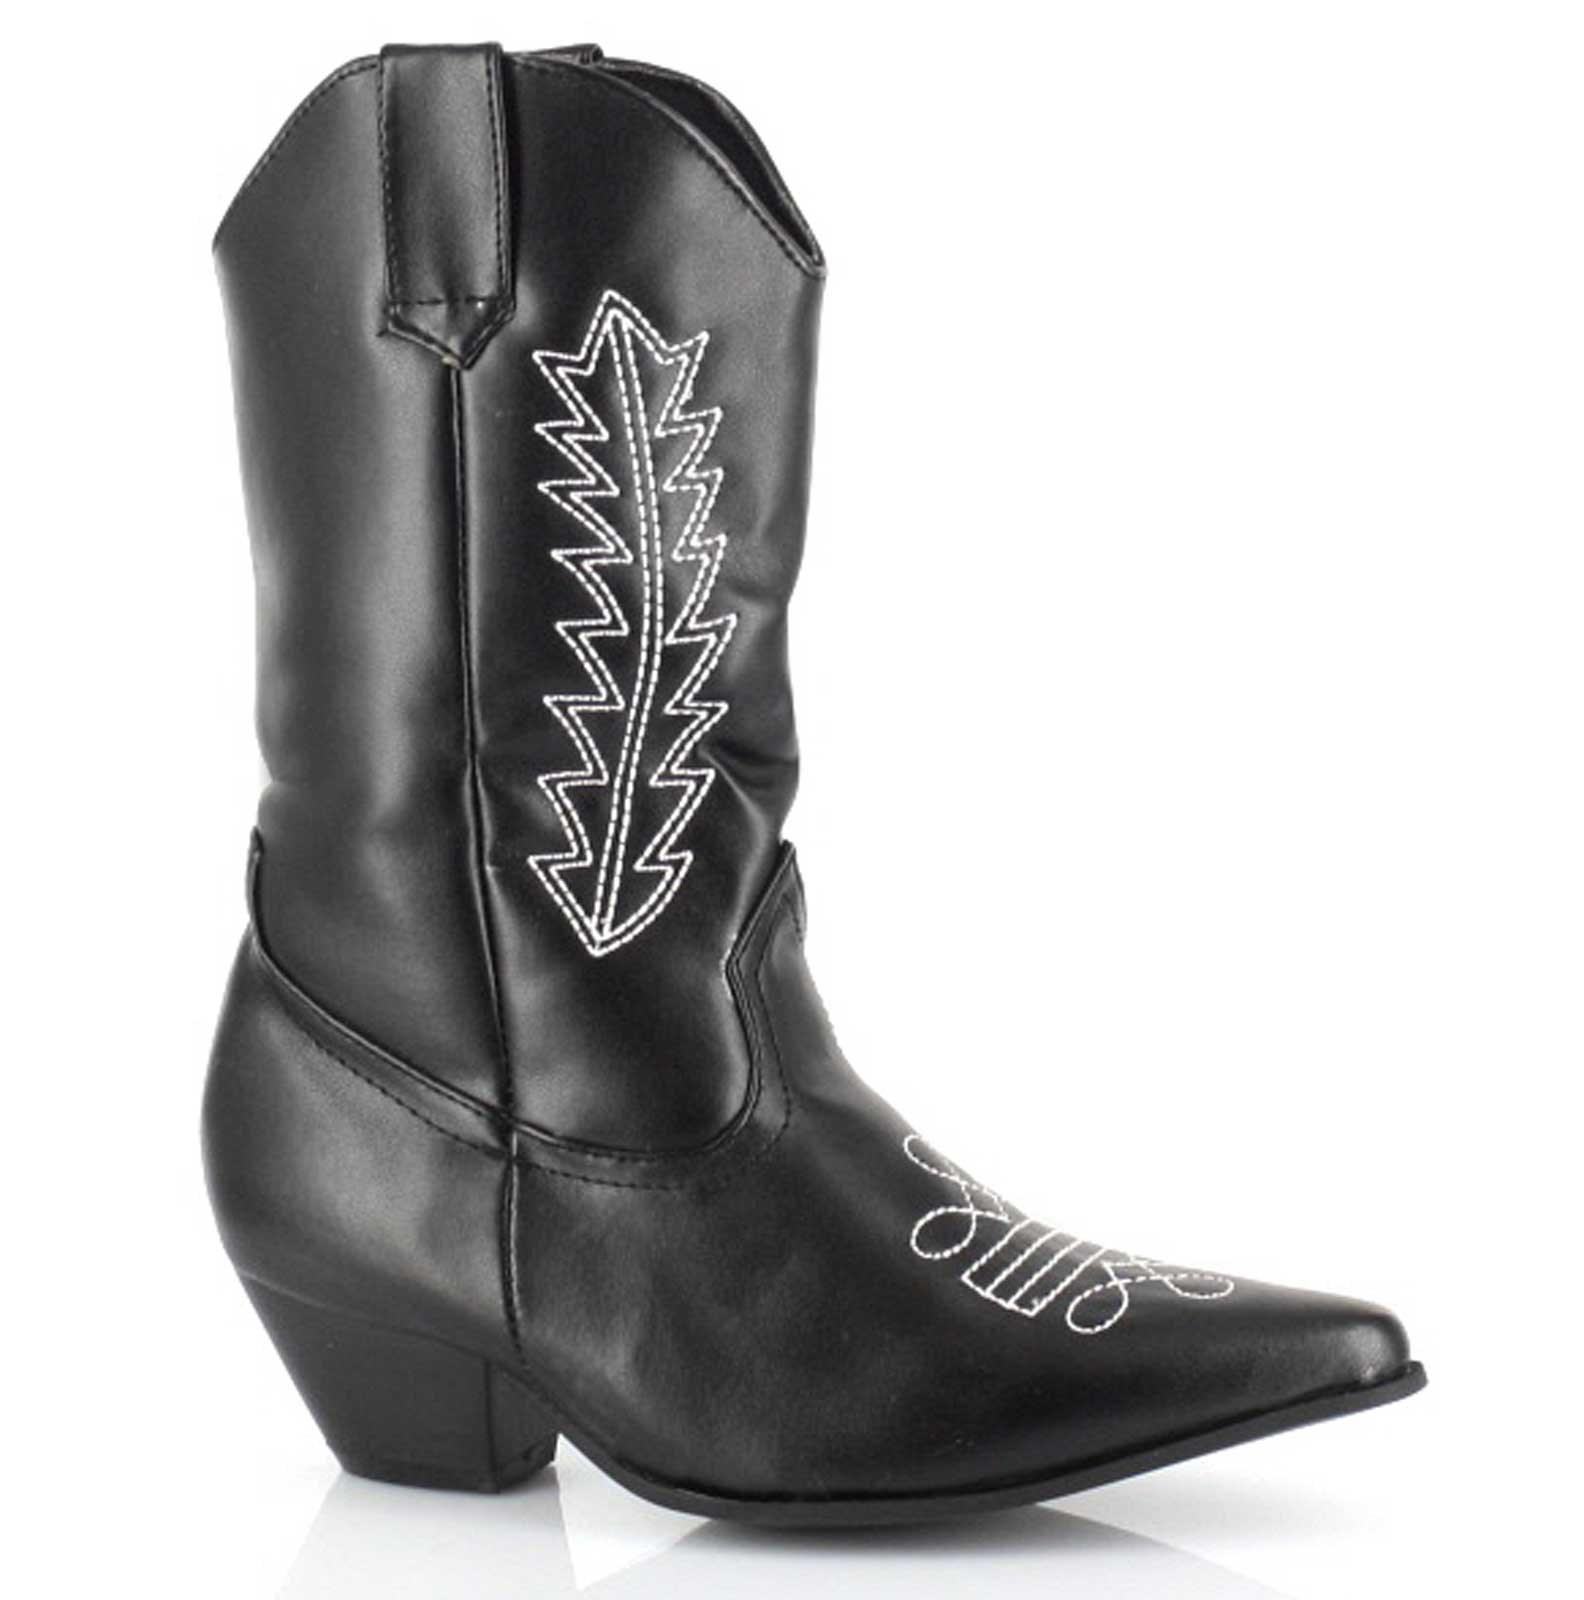 Image of Cowboy Boots (Black) Child Large (2/3)